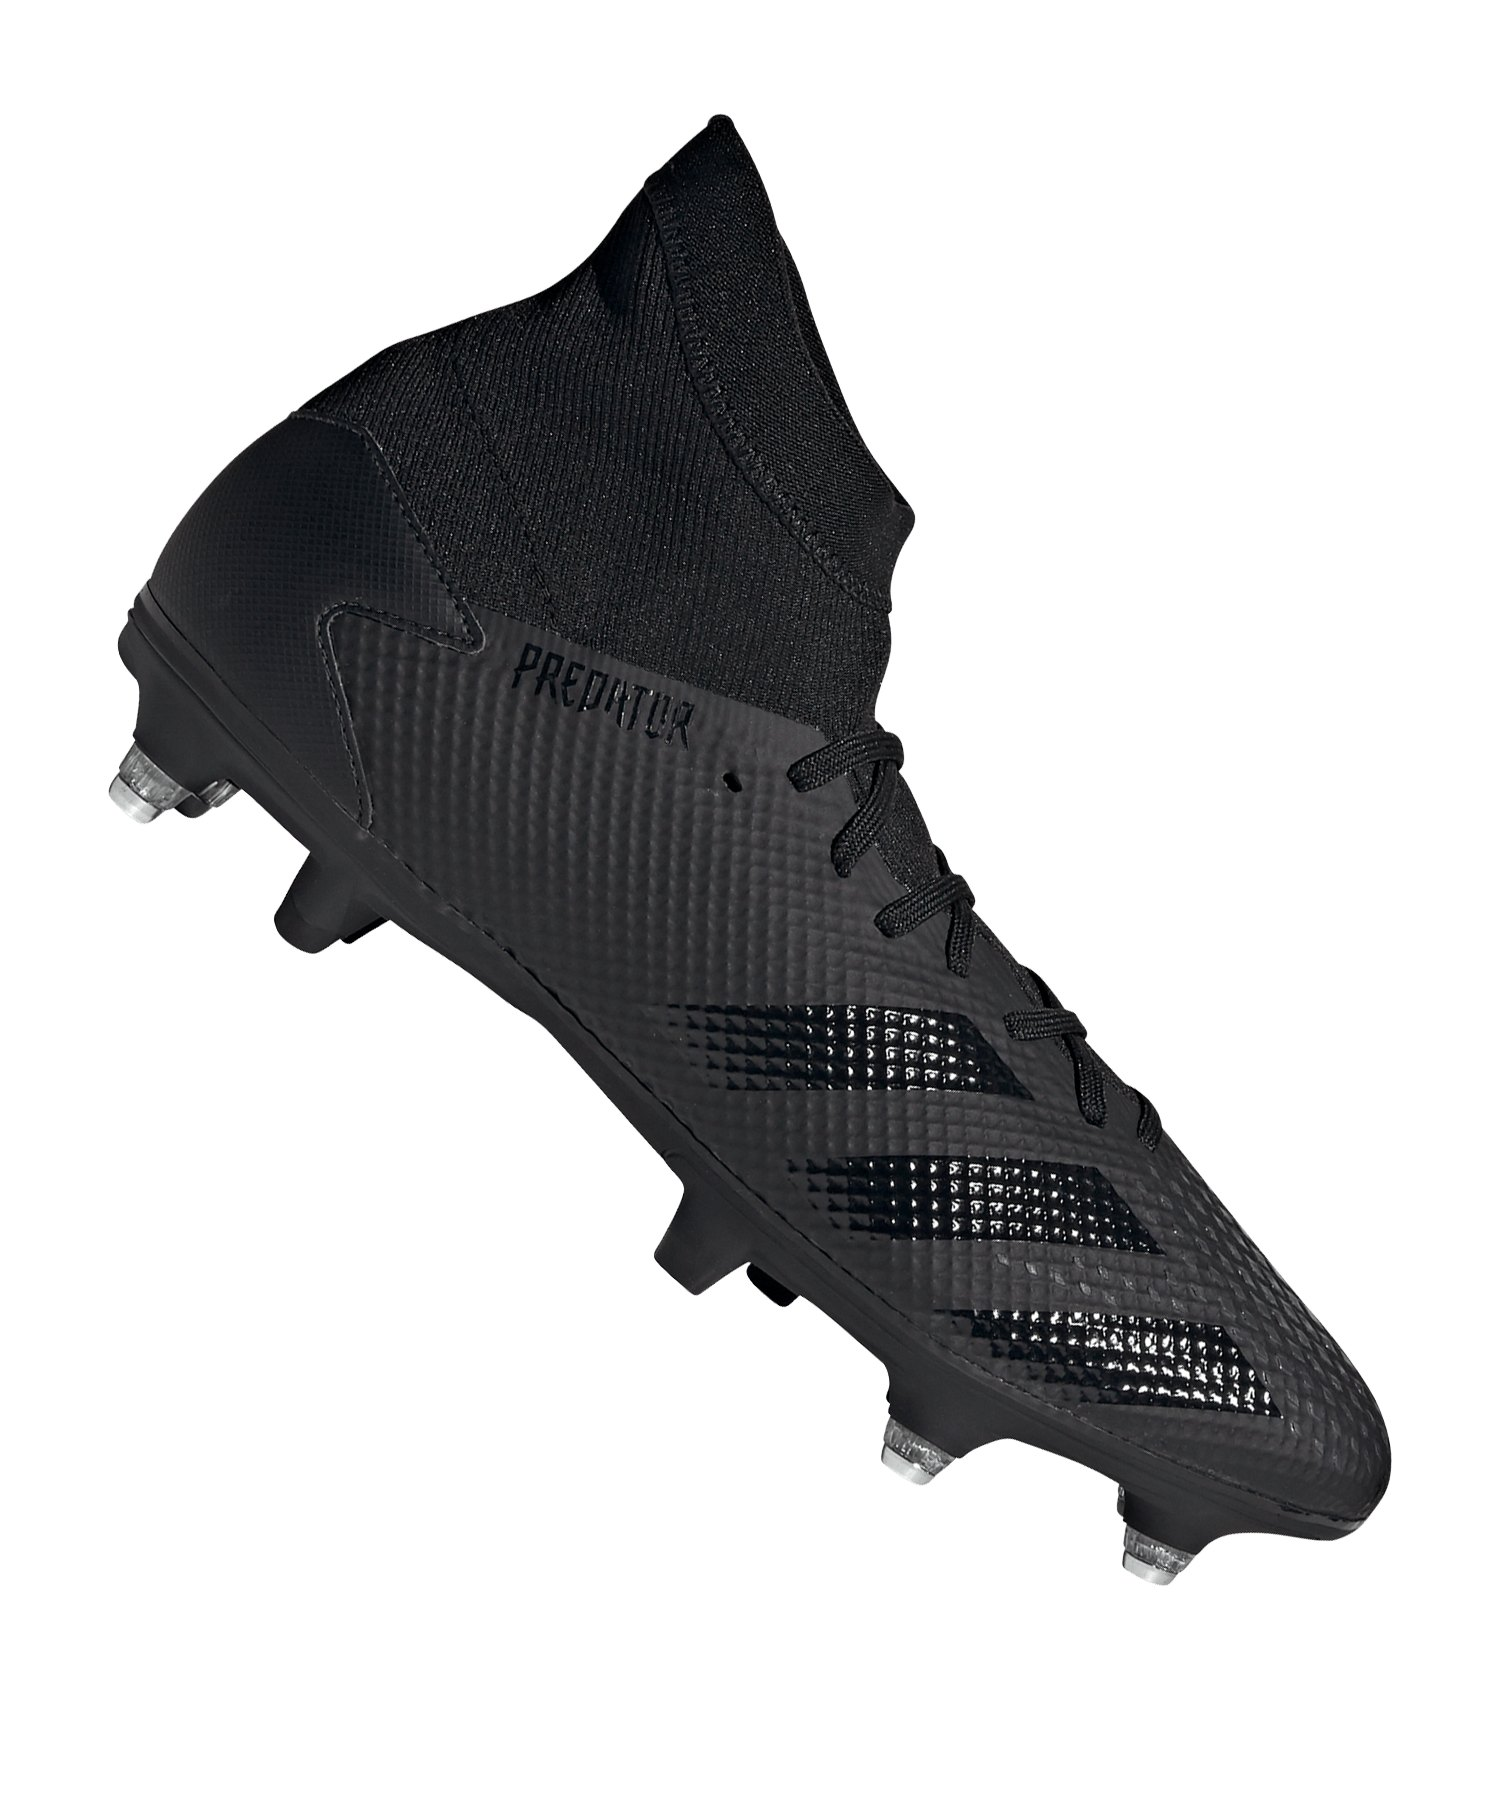 adidas Predator 20.3 SG Schwarz Grau - schwarz